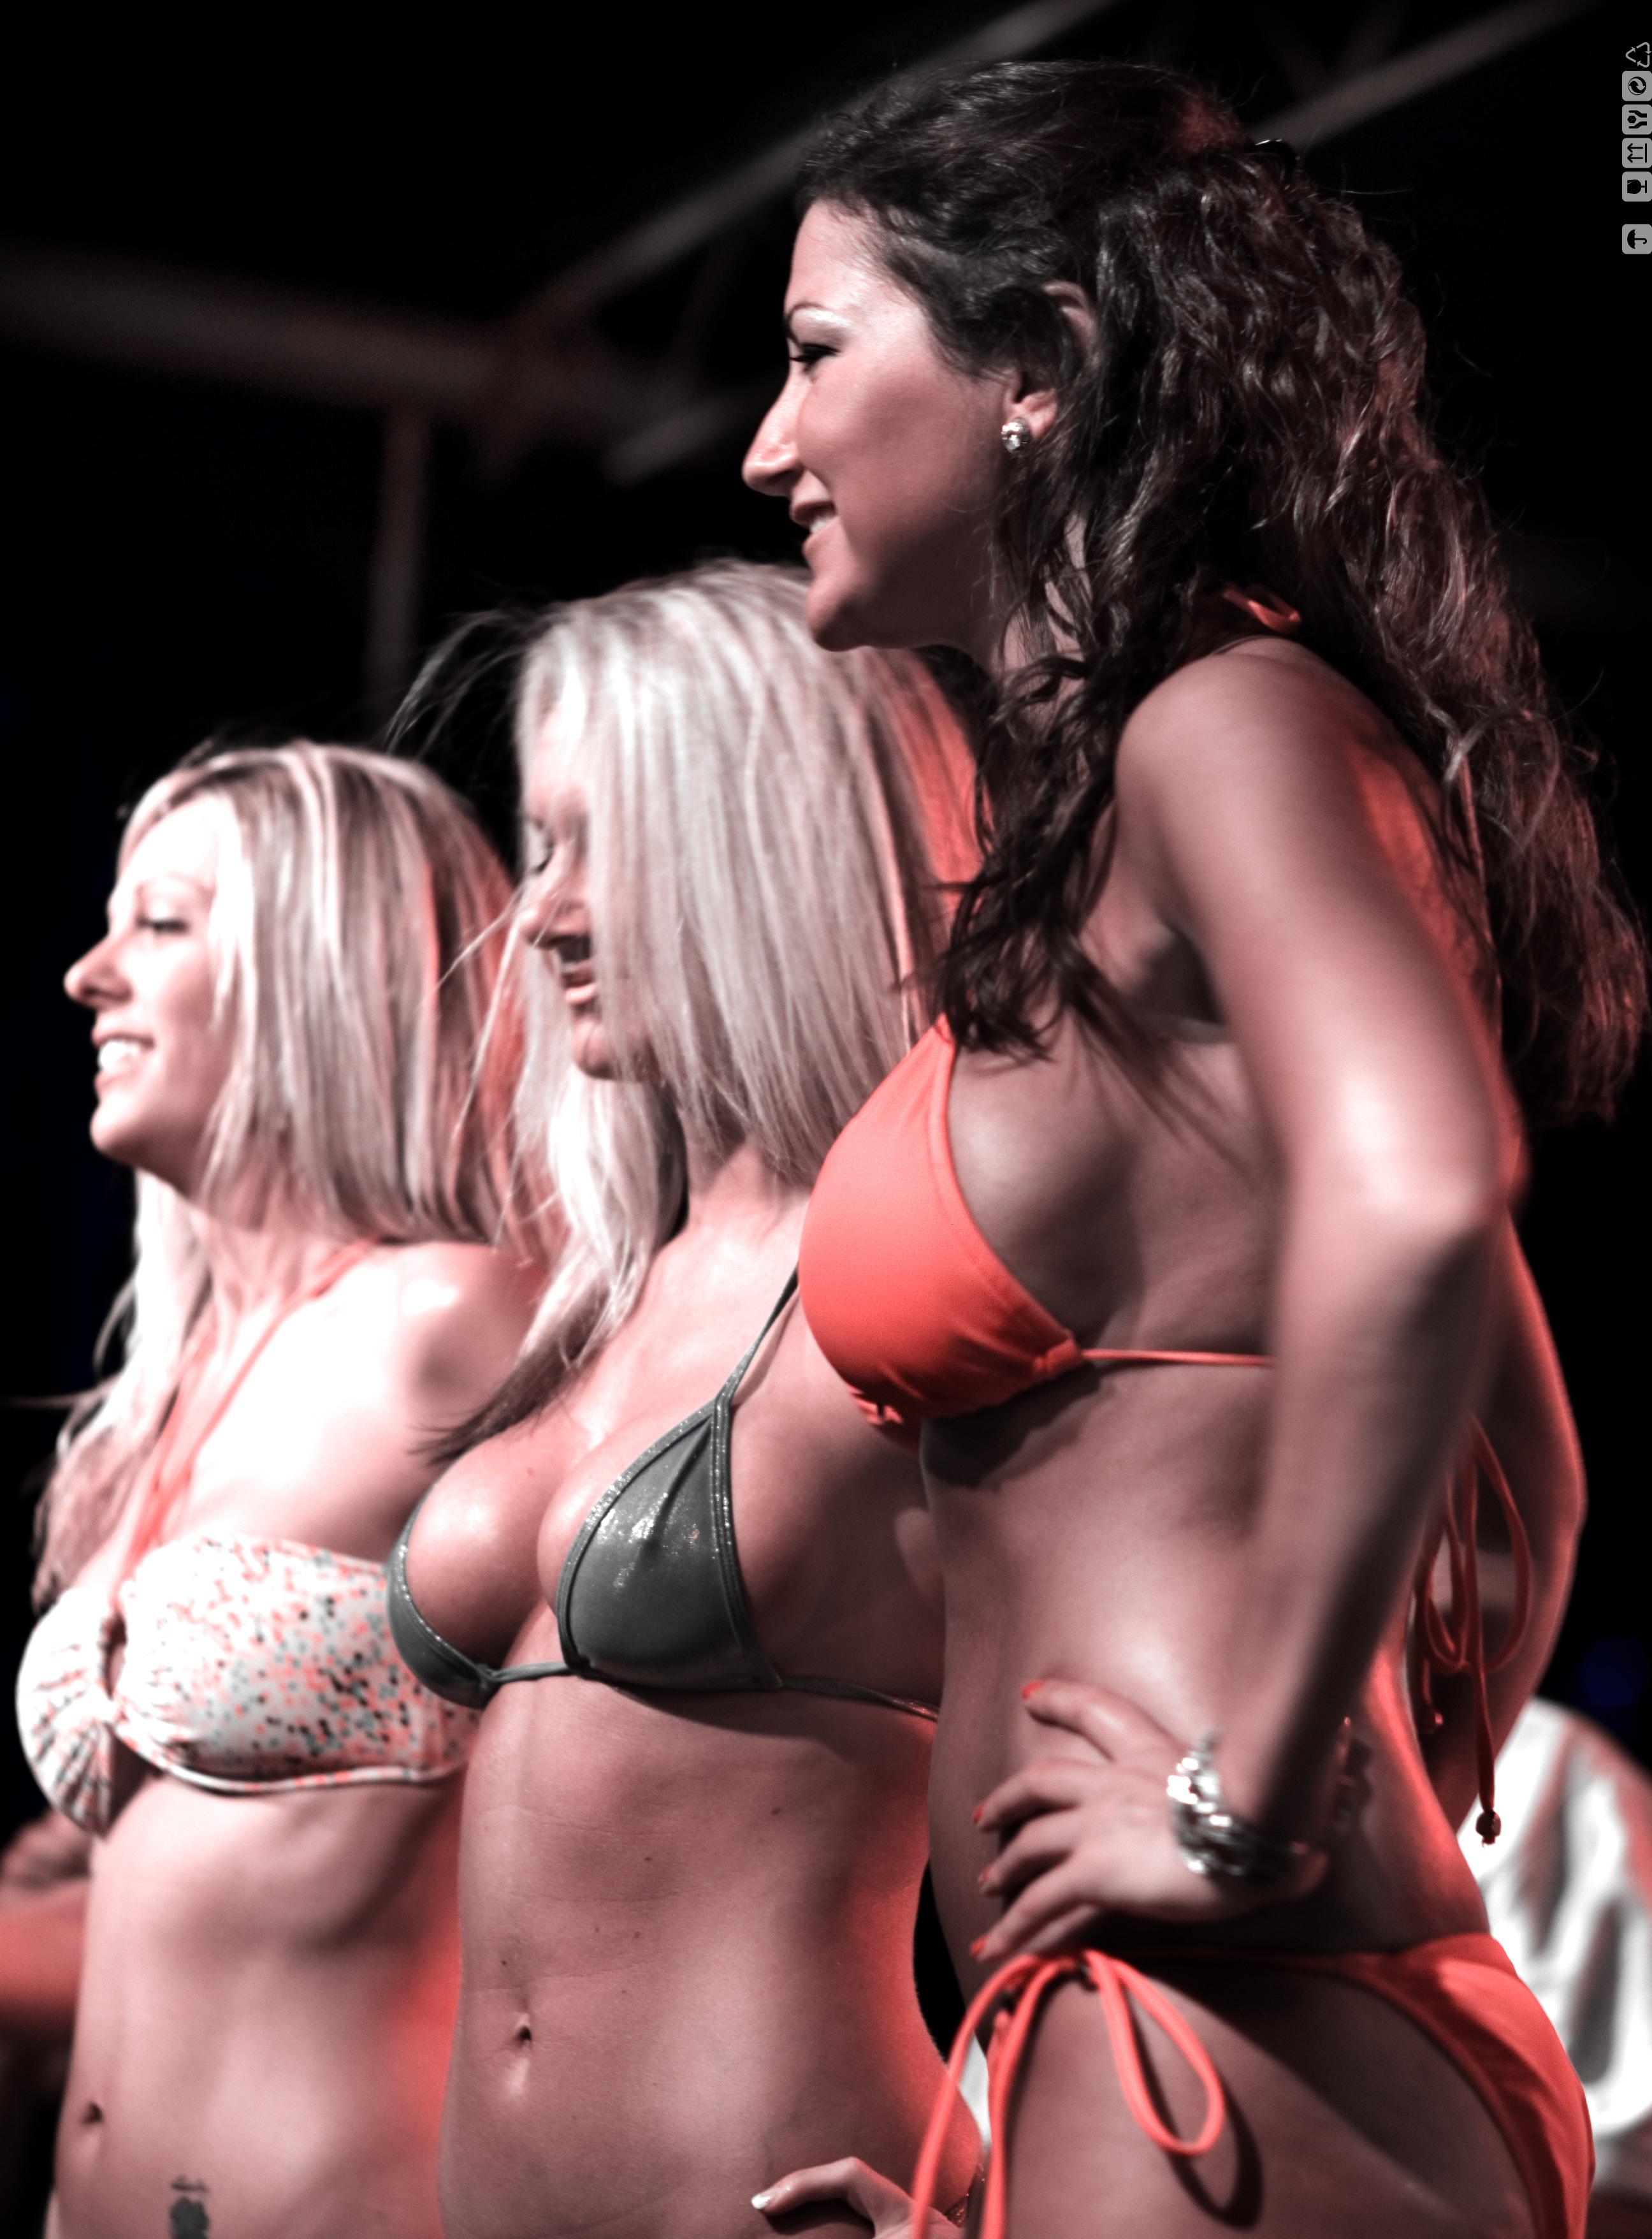 Venus Bikini Contest 015 Then welcome to Zoe's erotic gallery!